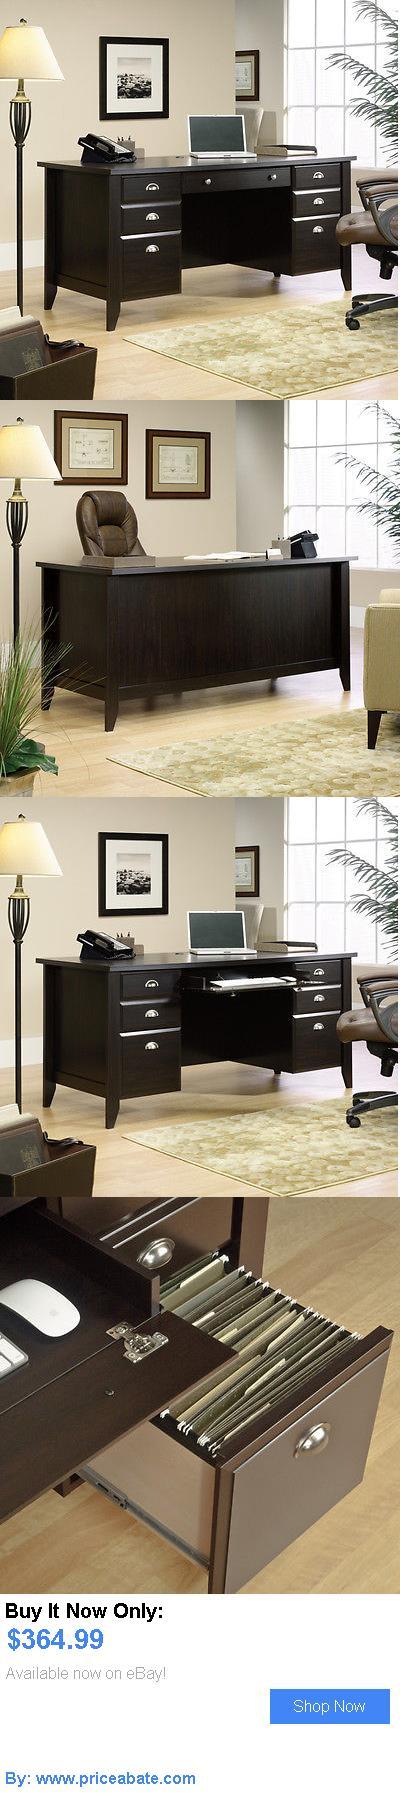 Office Furniture: New Sauder Furniture 408920 Home Office Shoal Creek Dark Wood Executive Cpu Desk BUY IT NOW ONLY: $364.99 #priceabateOfficeFurniture OR #priceabate